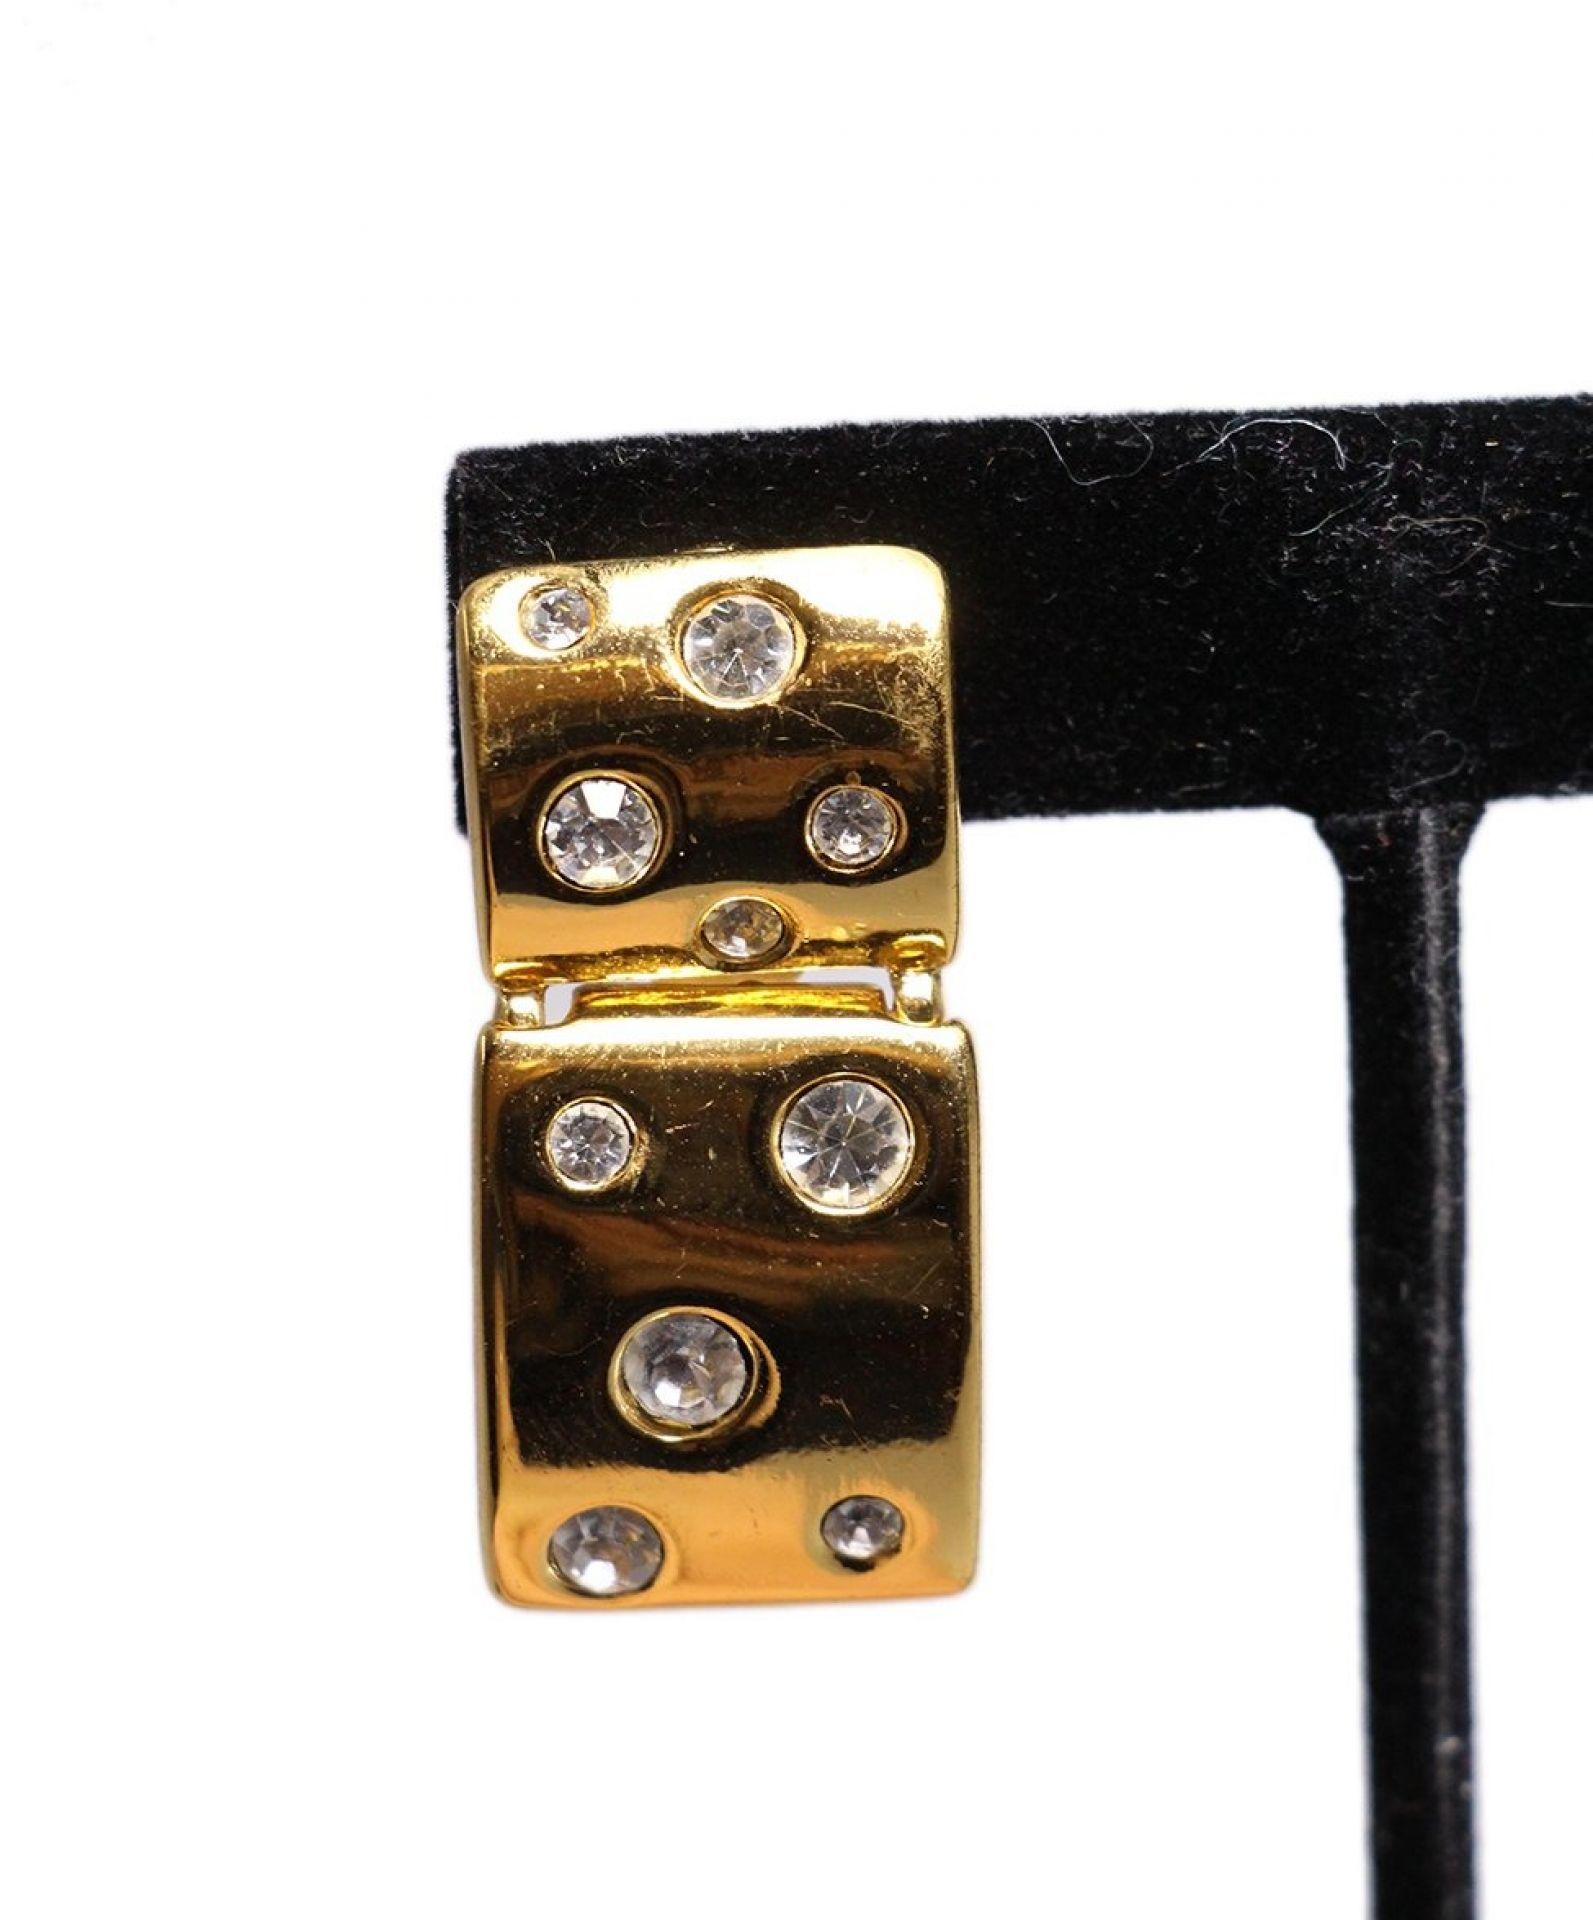 YSL METALLIC GOLD RHINESTONE CLIP-ON EARRINGS